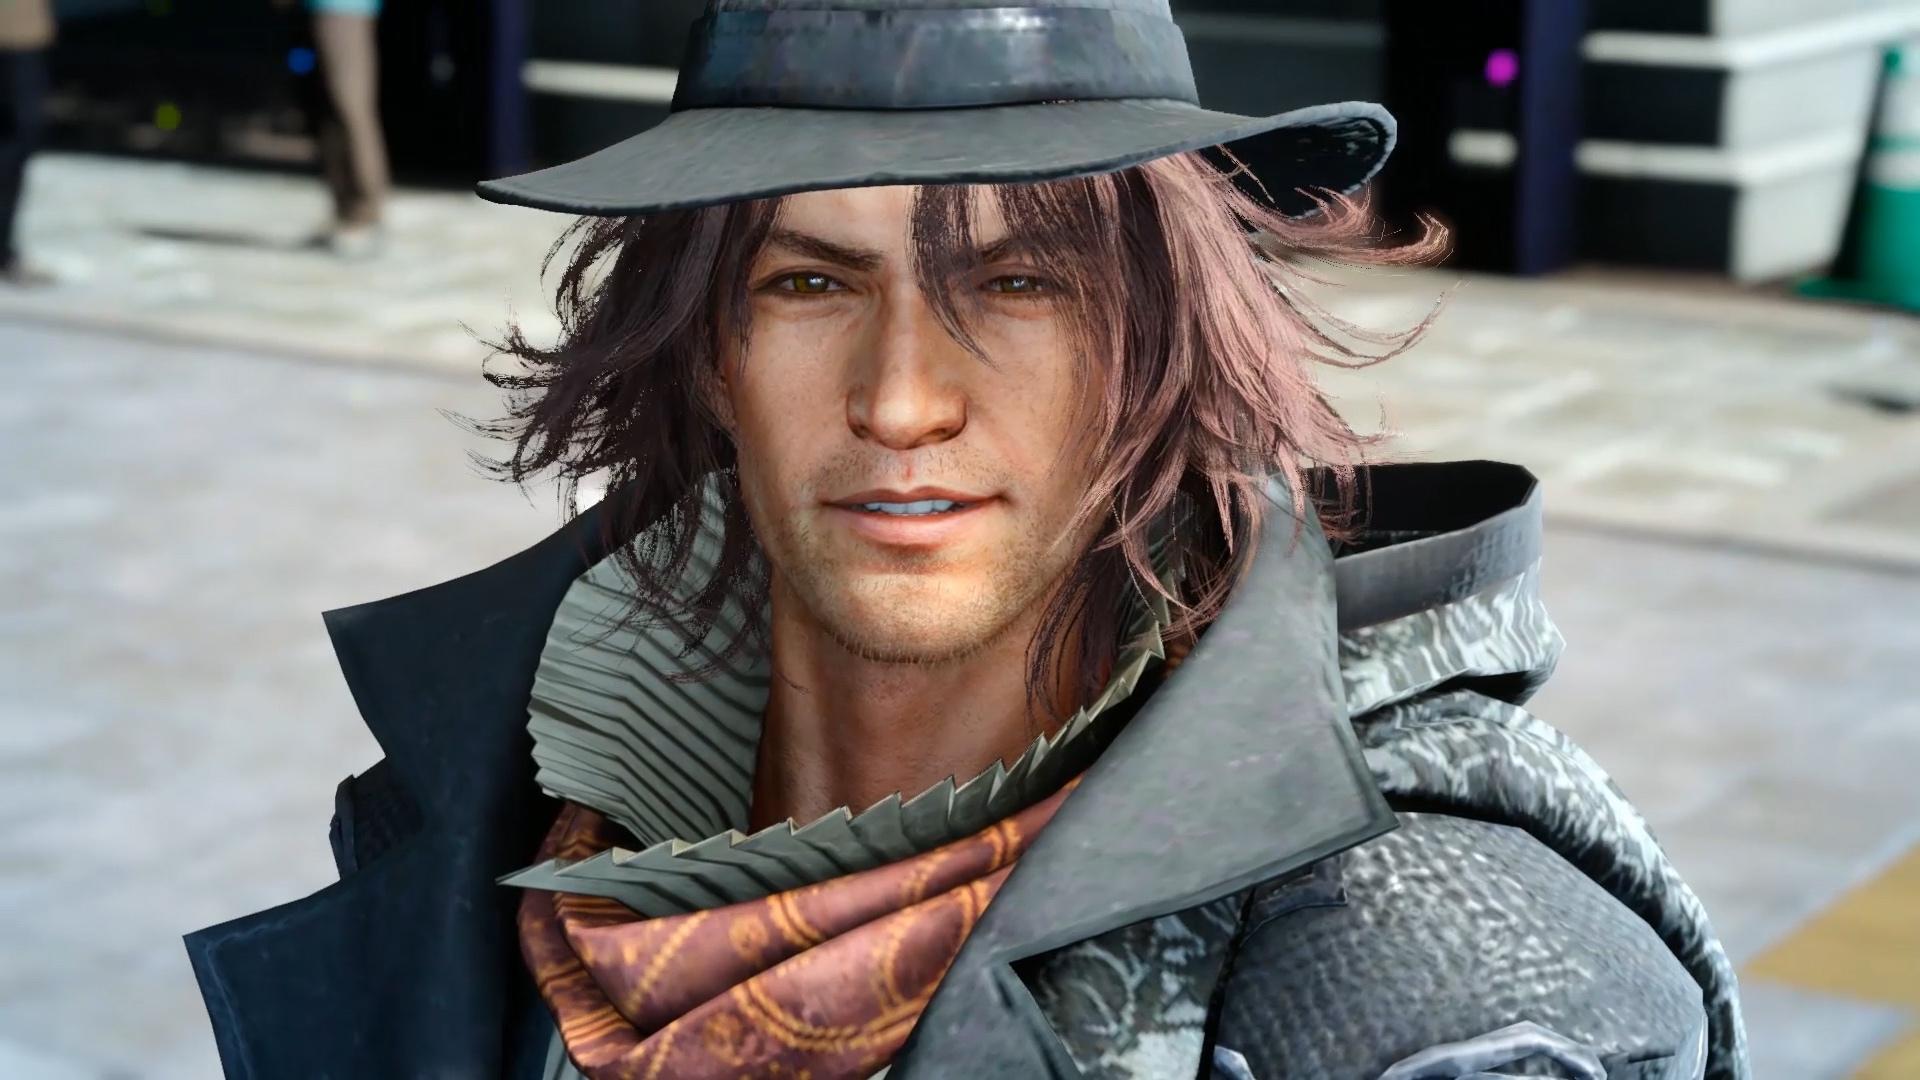 Final Fantasy 15 character DLC canceled, game director Hajime Tabata quits